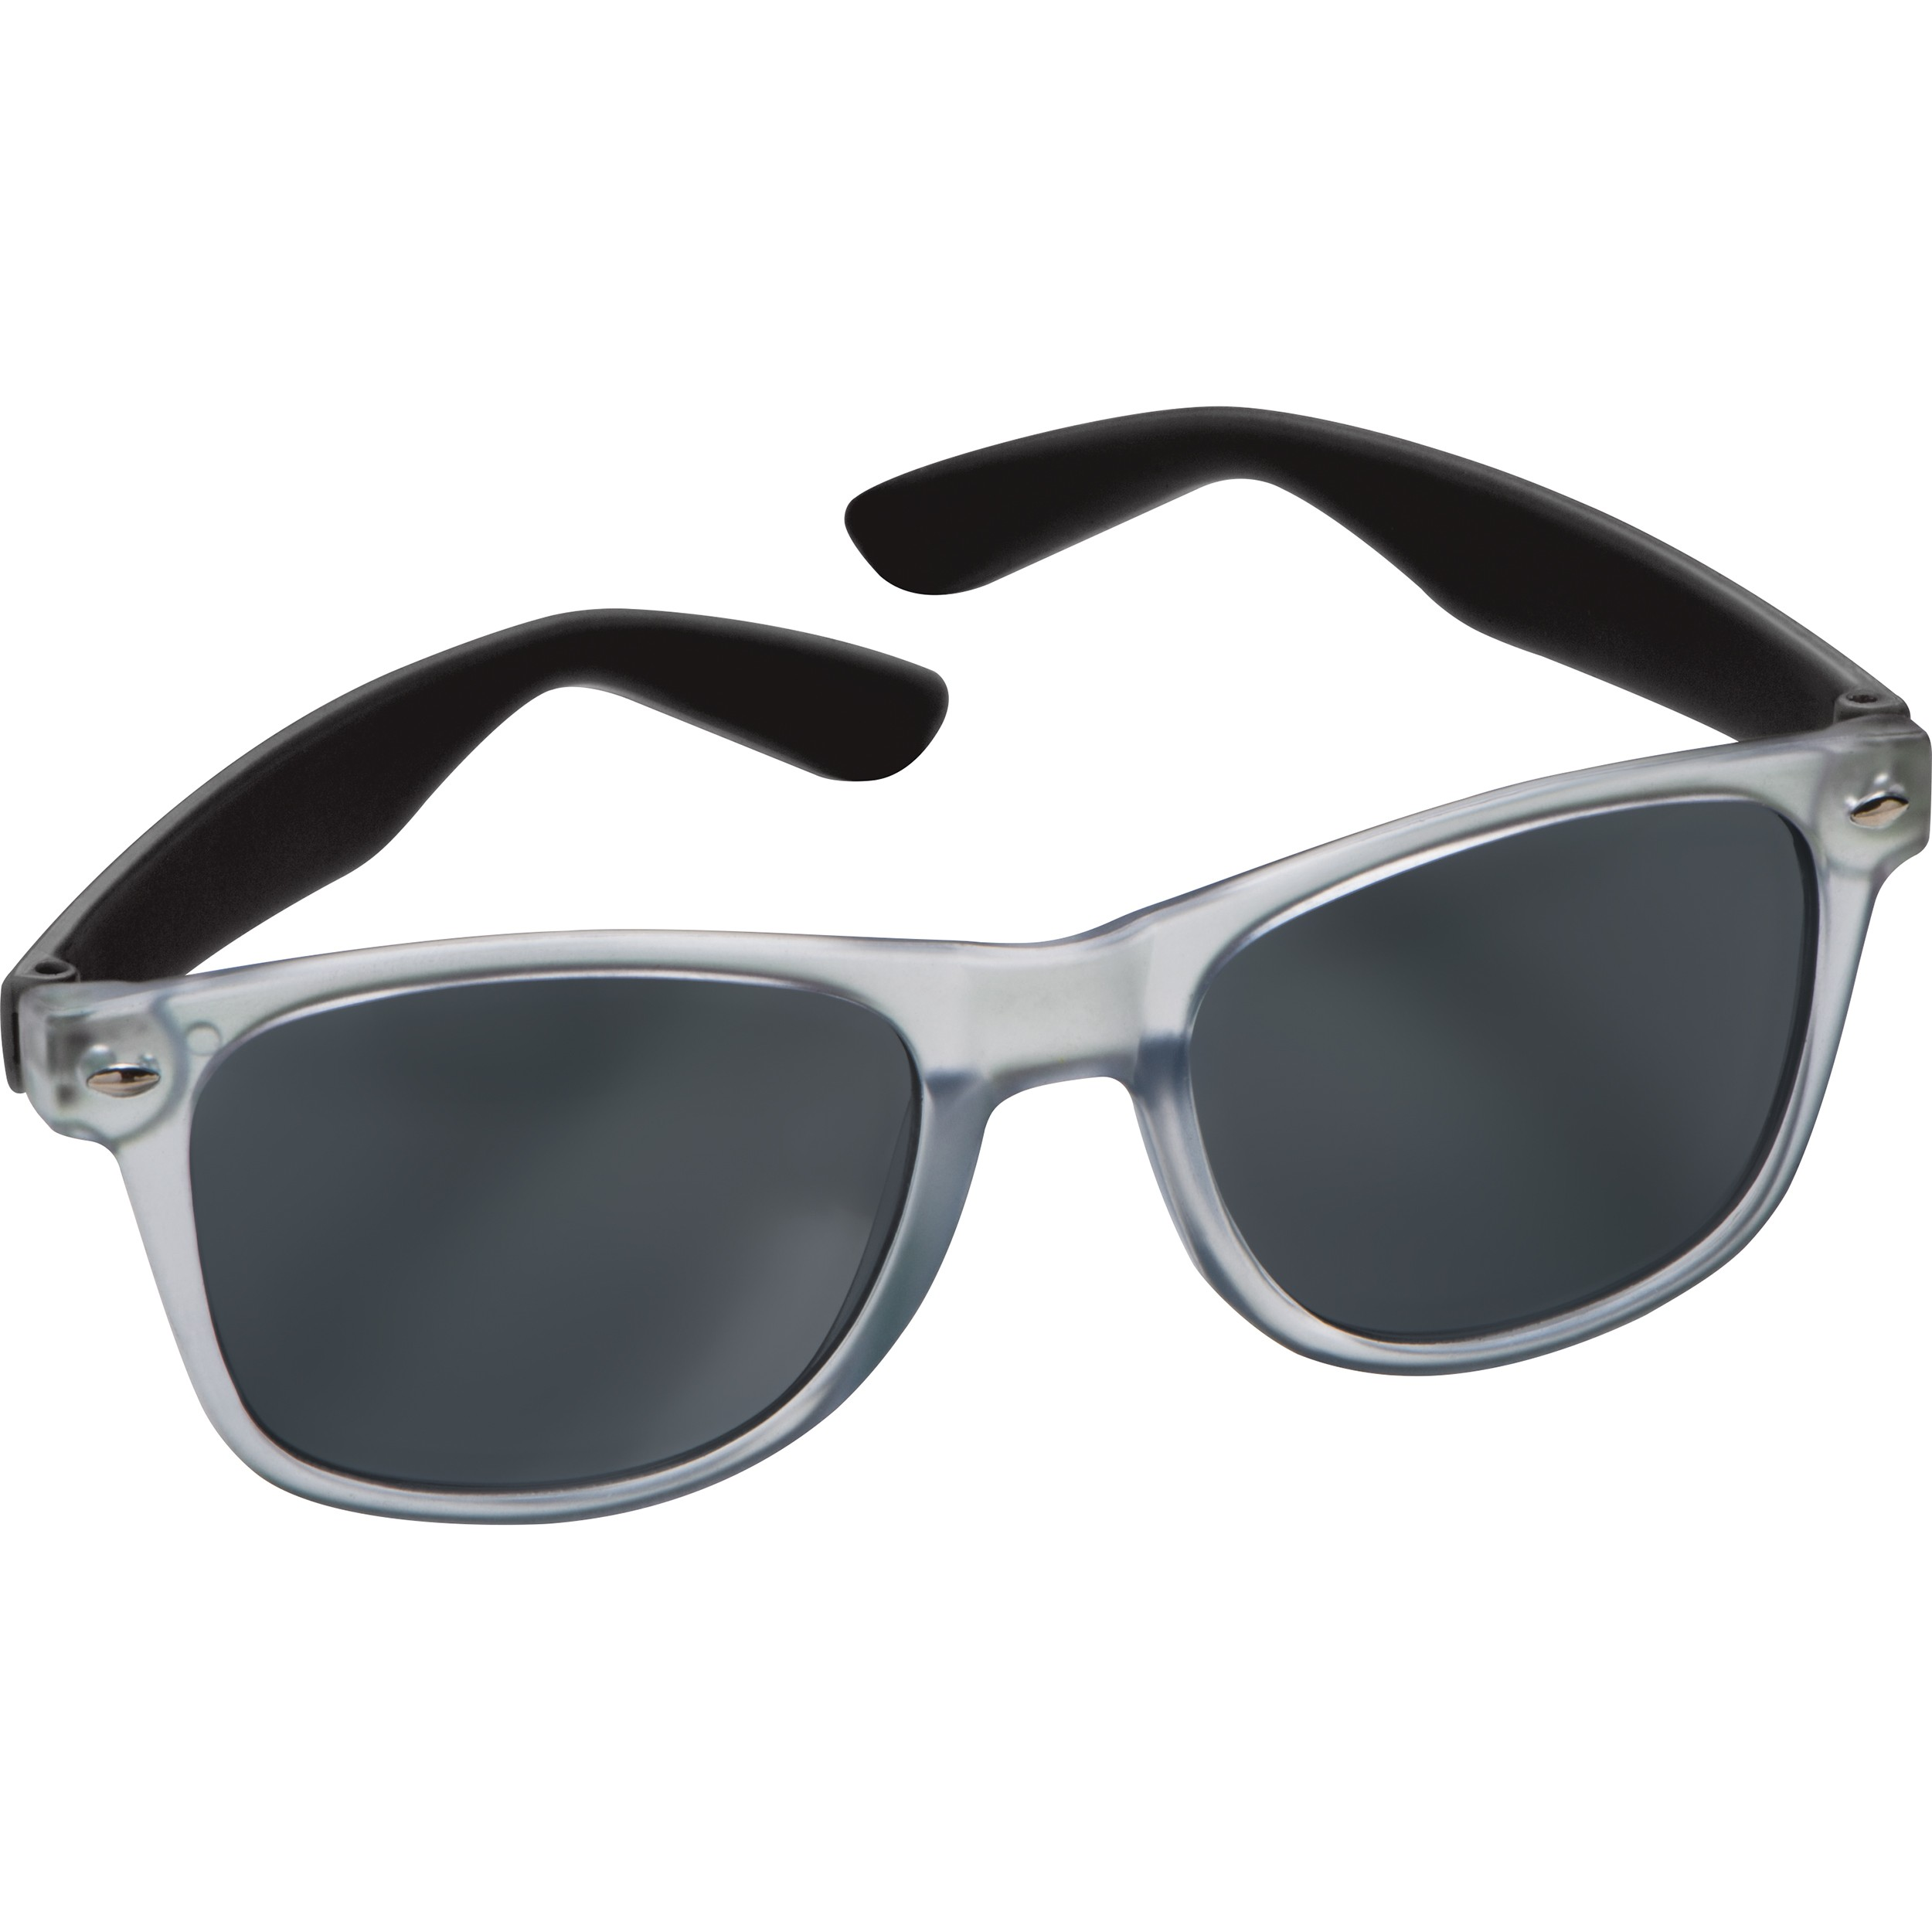 Sonnenbrille Dakar